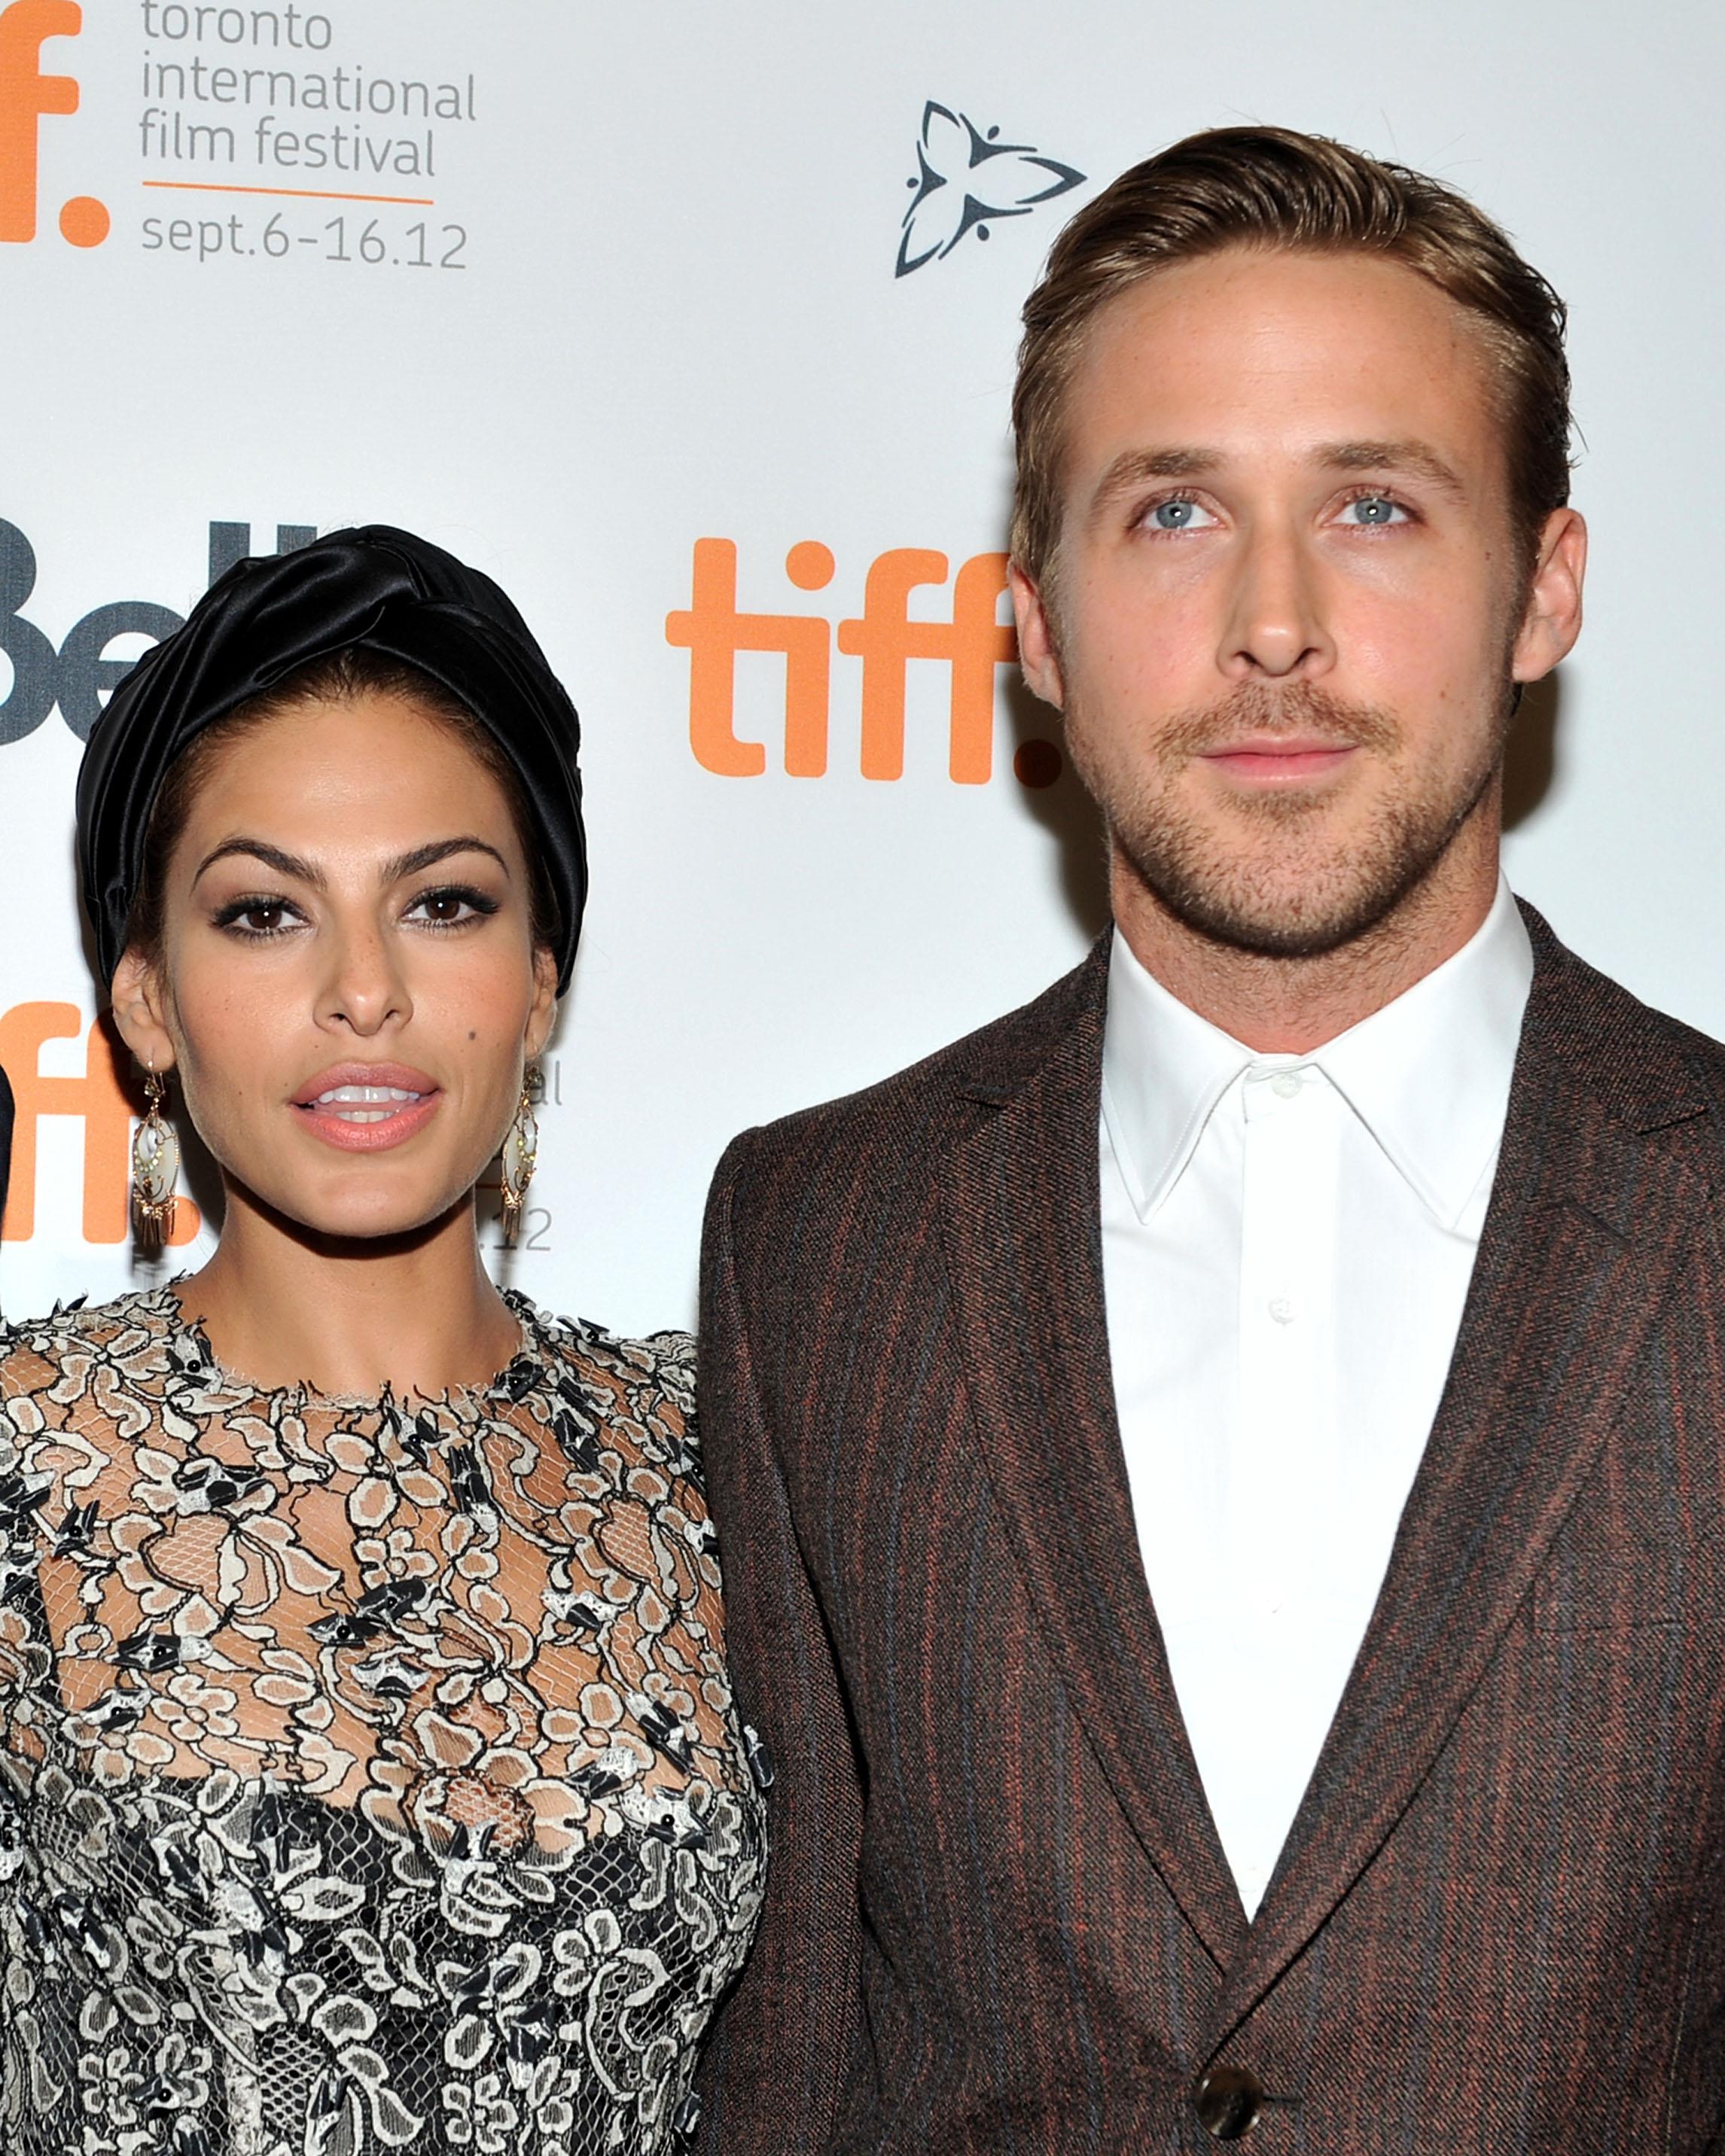 celebrity-couples-eva-mendes-ryan-gosling-1215.jpg